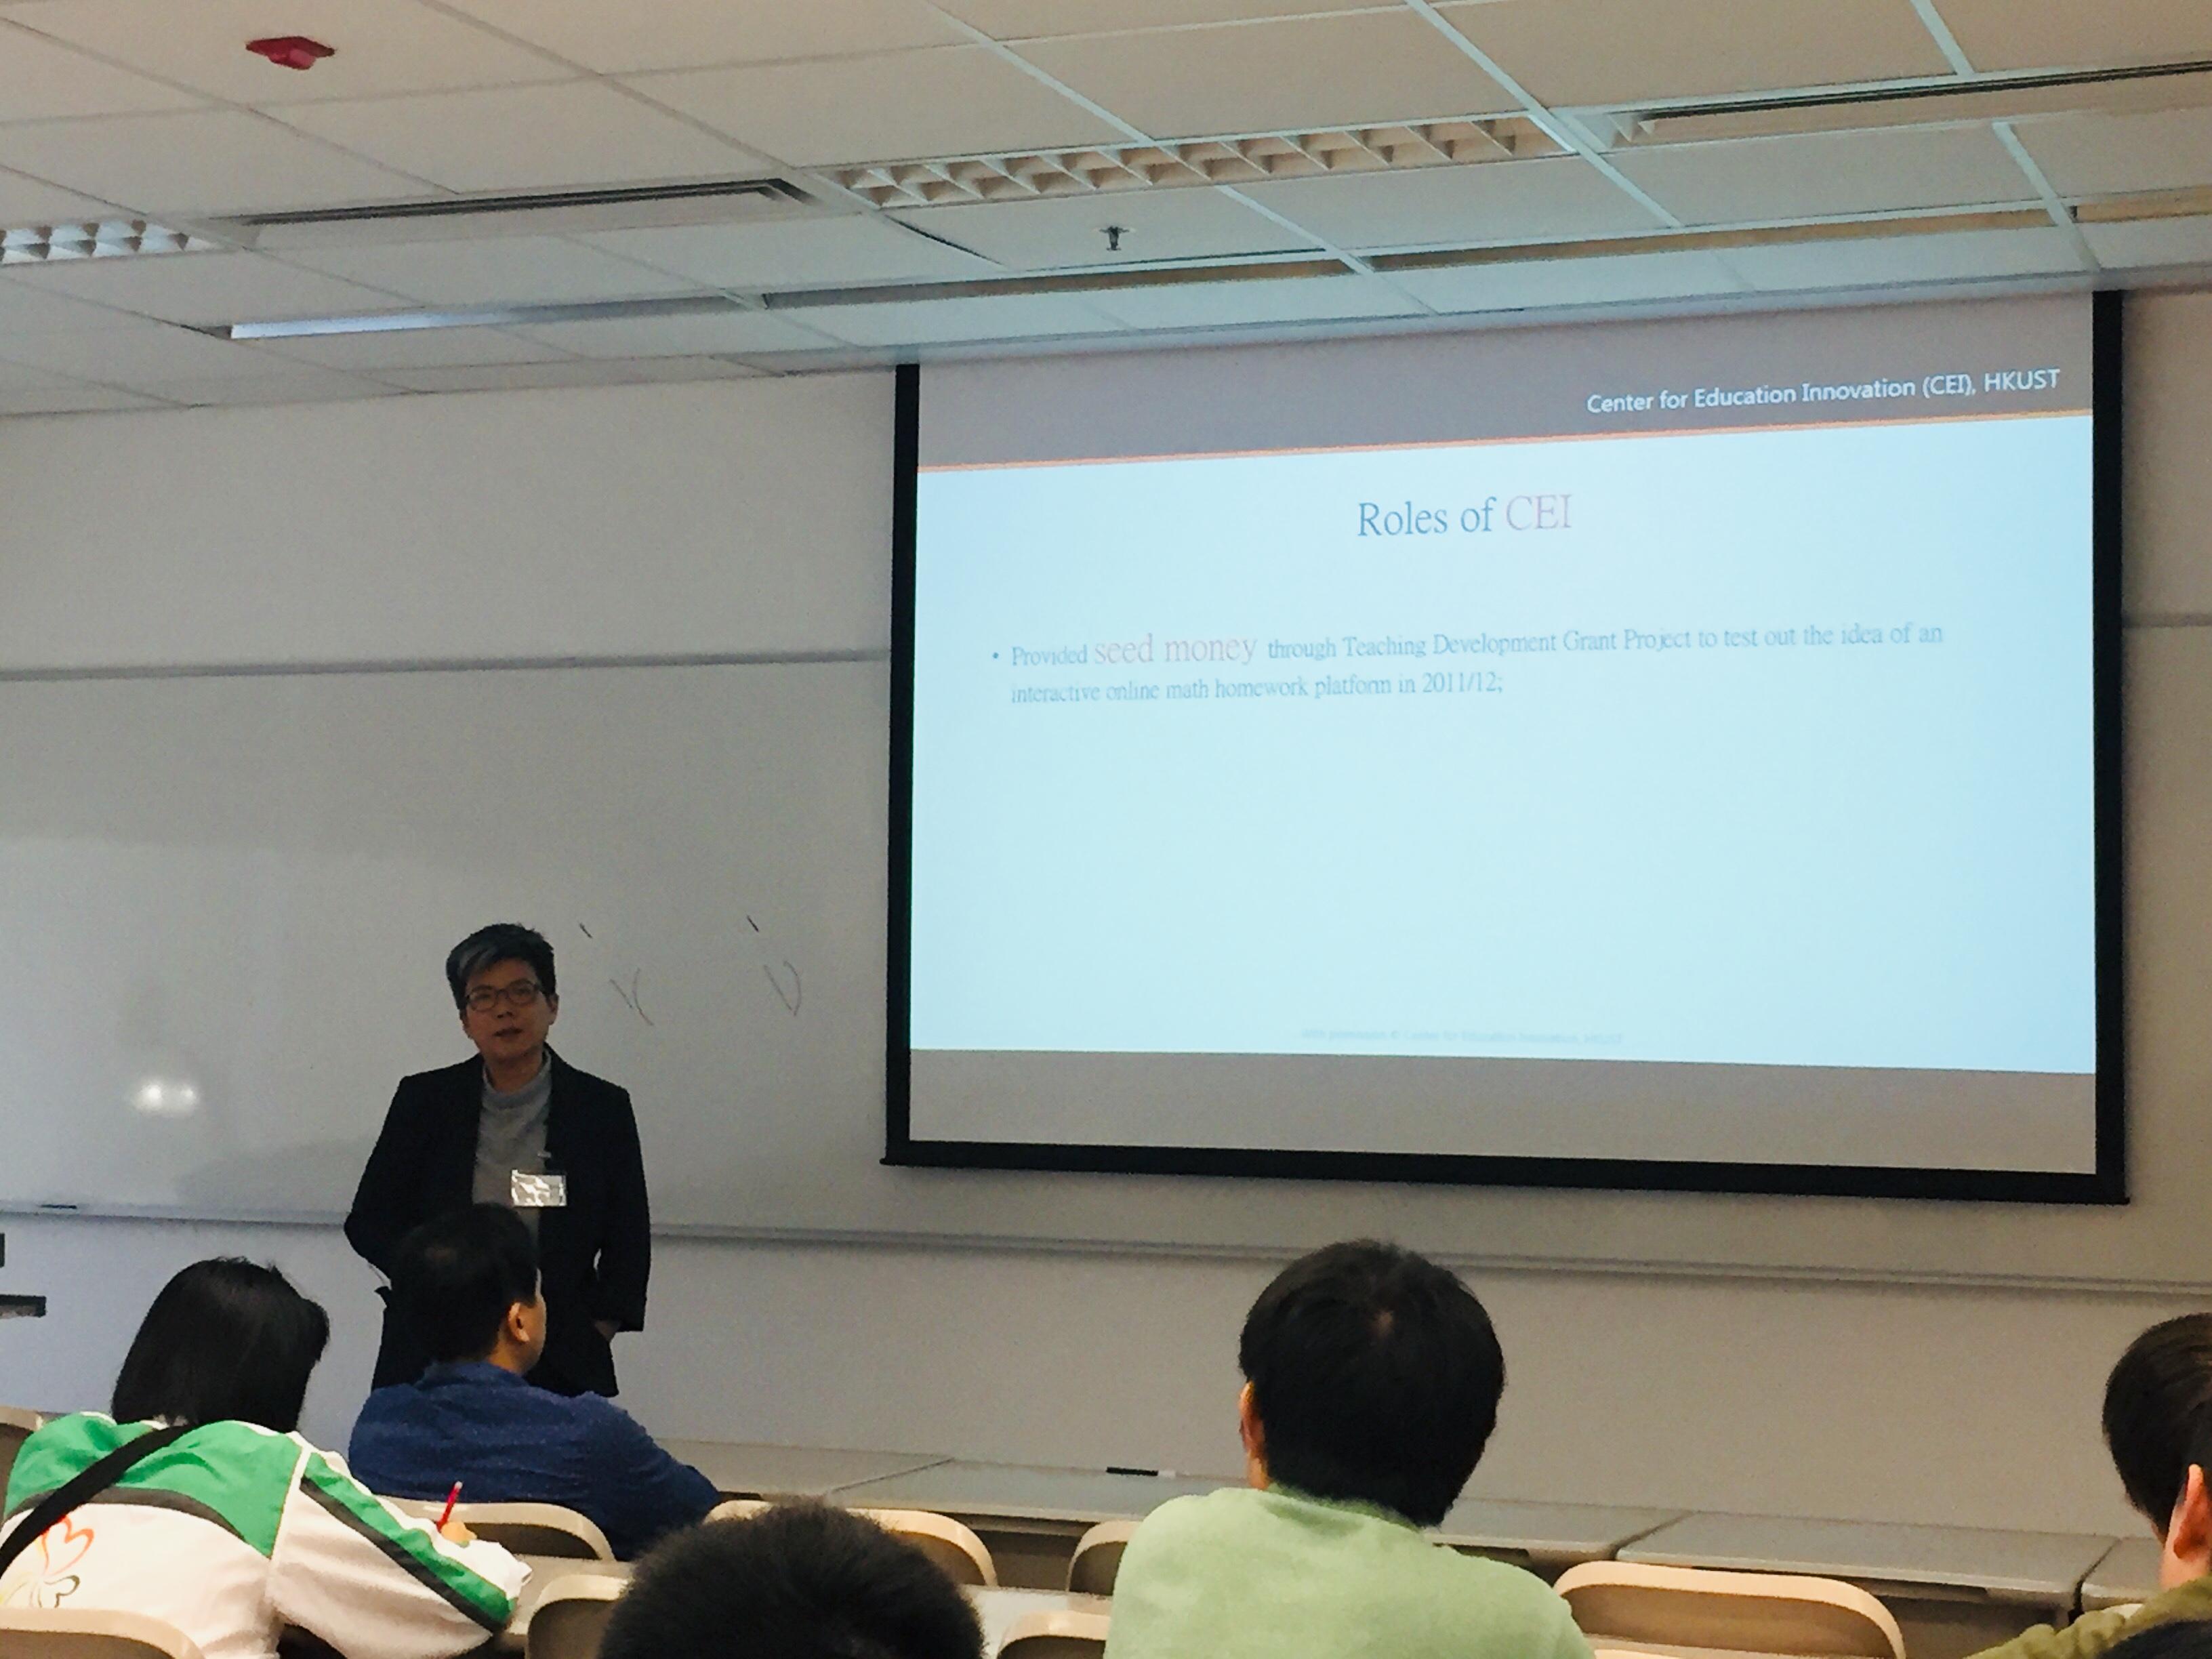 Dr. Beatrice Chu